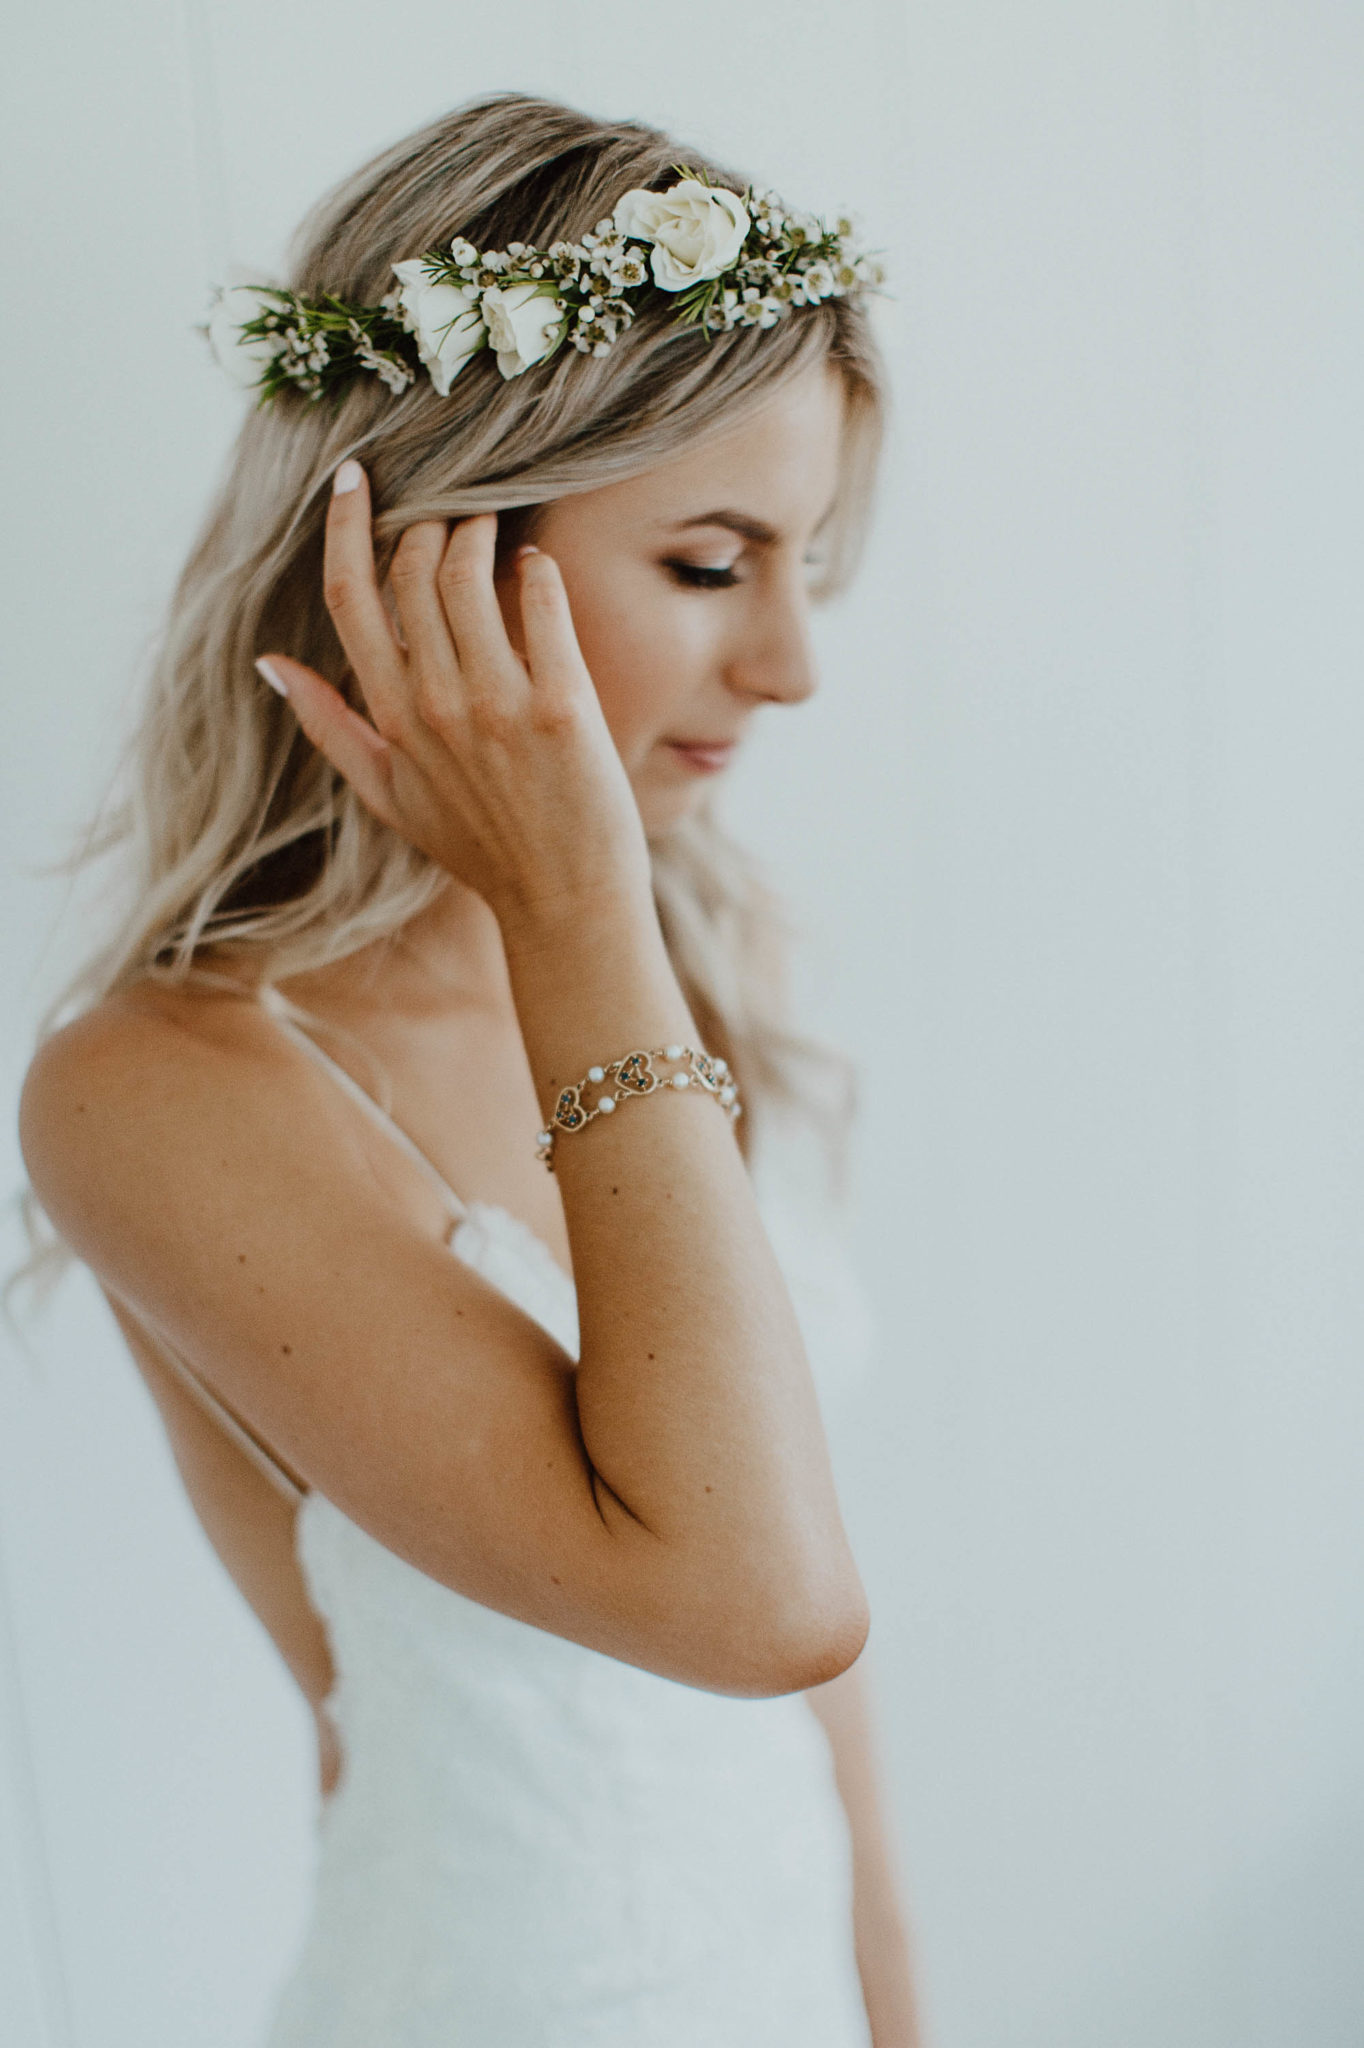 white lace wedding dress blush flowers white flower crown